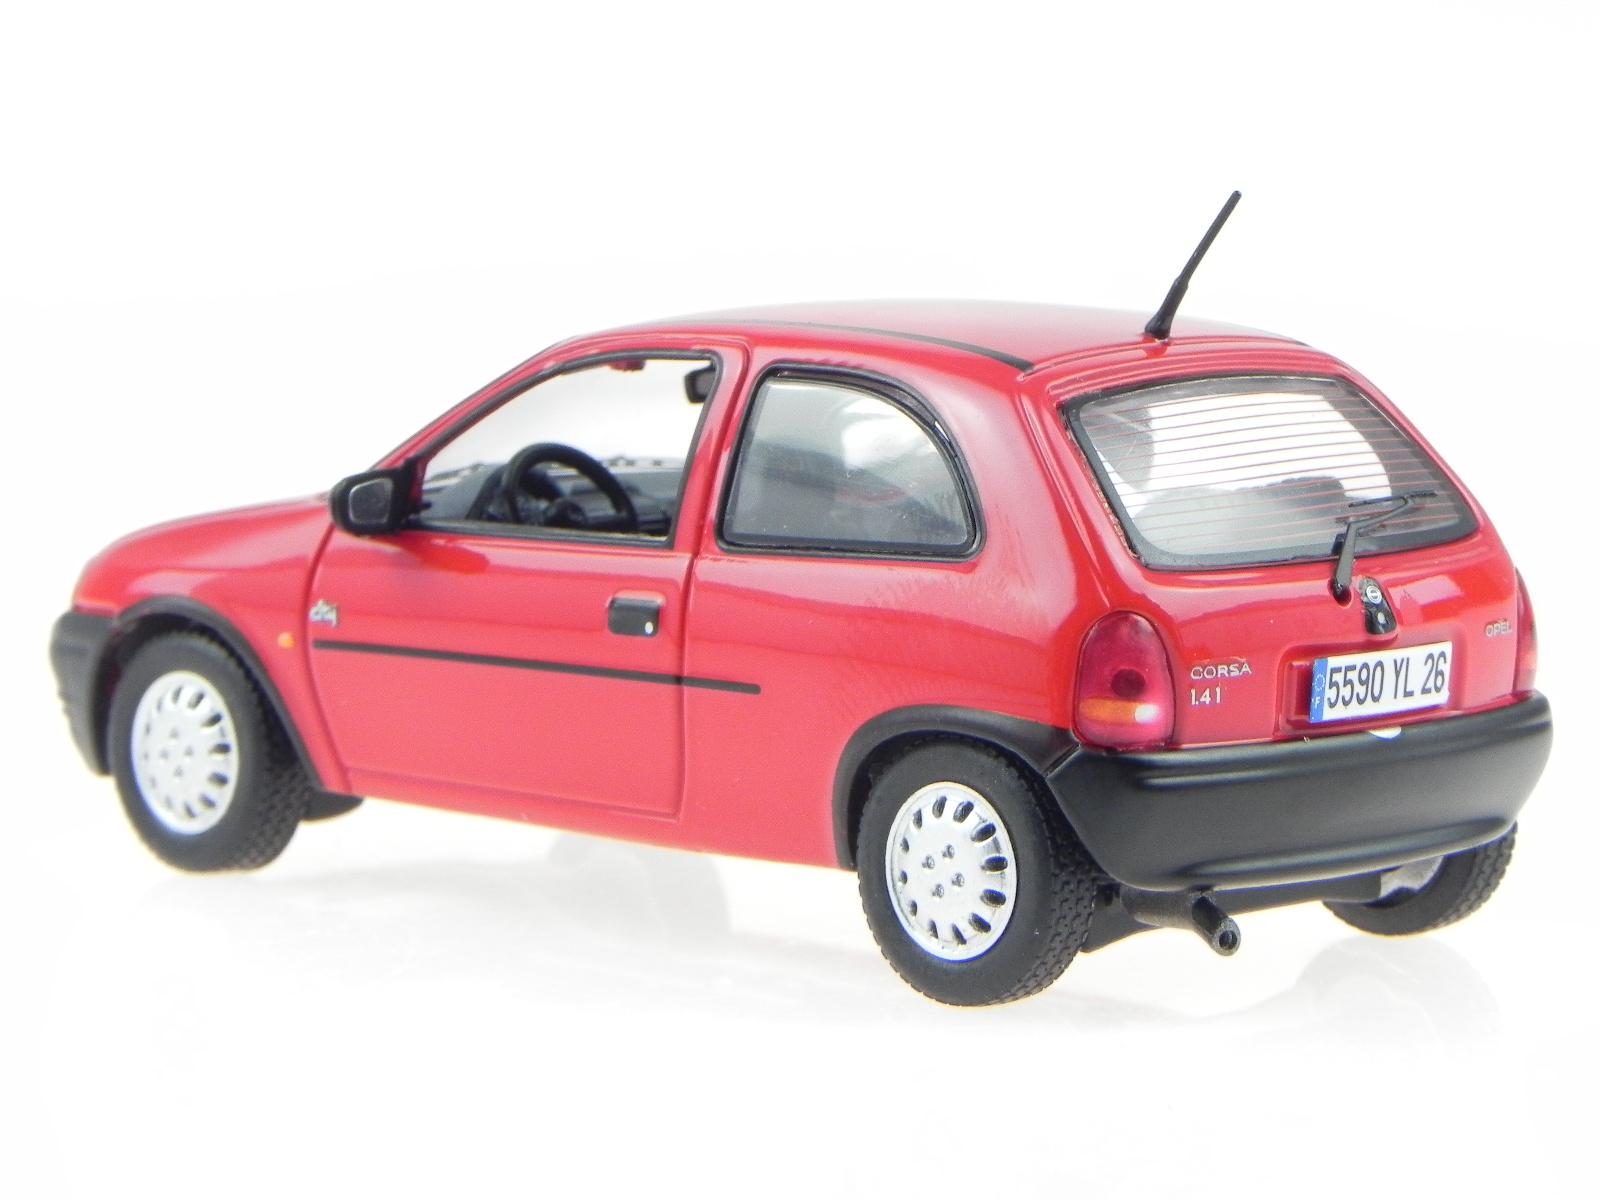 opel corsa b 1994 rot modellauto prd427 premiumx 1 43 ebay. Black Bedroom Furniture Sets. Home Design Ideas